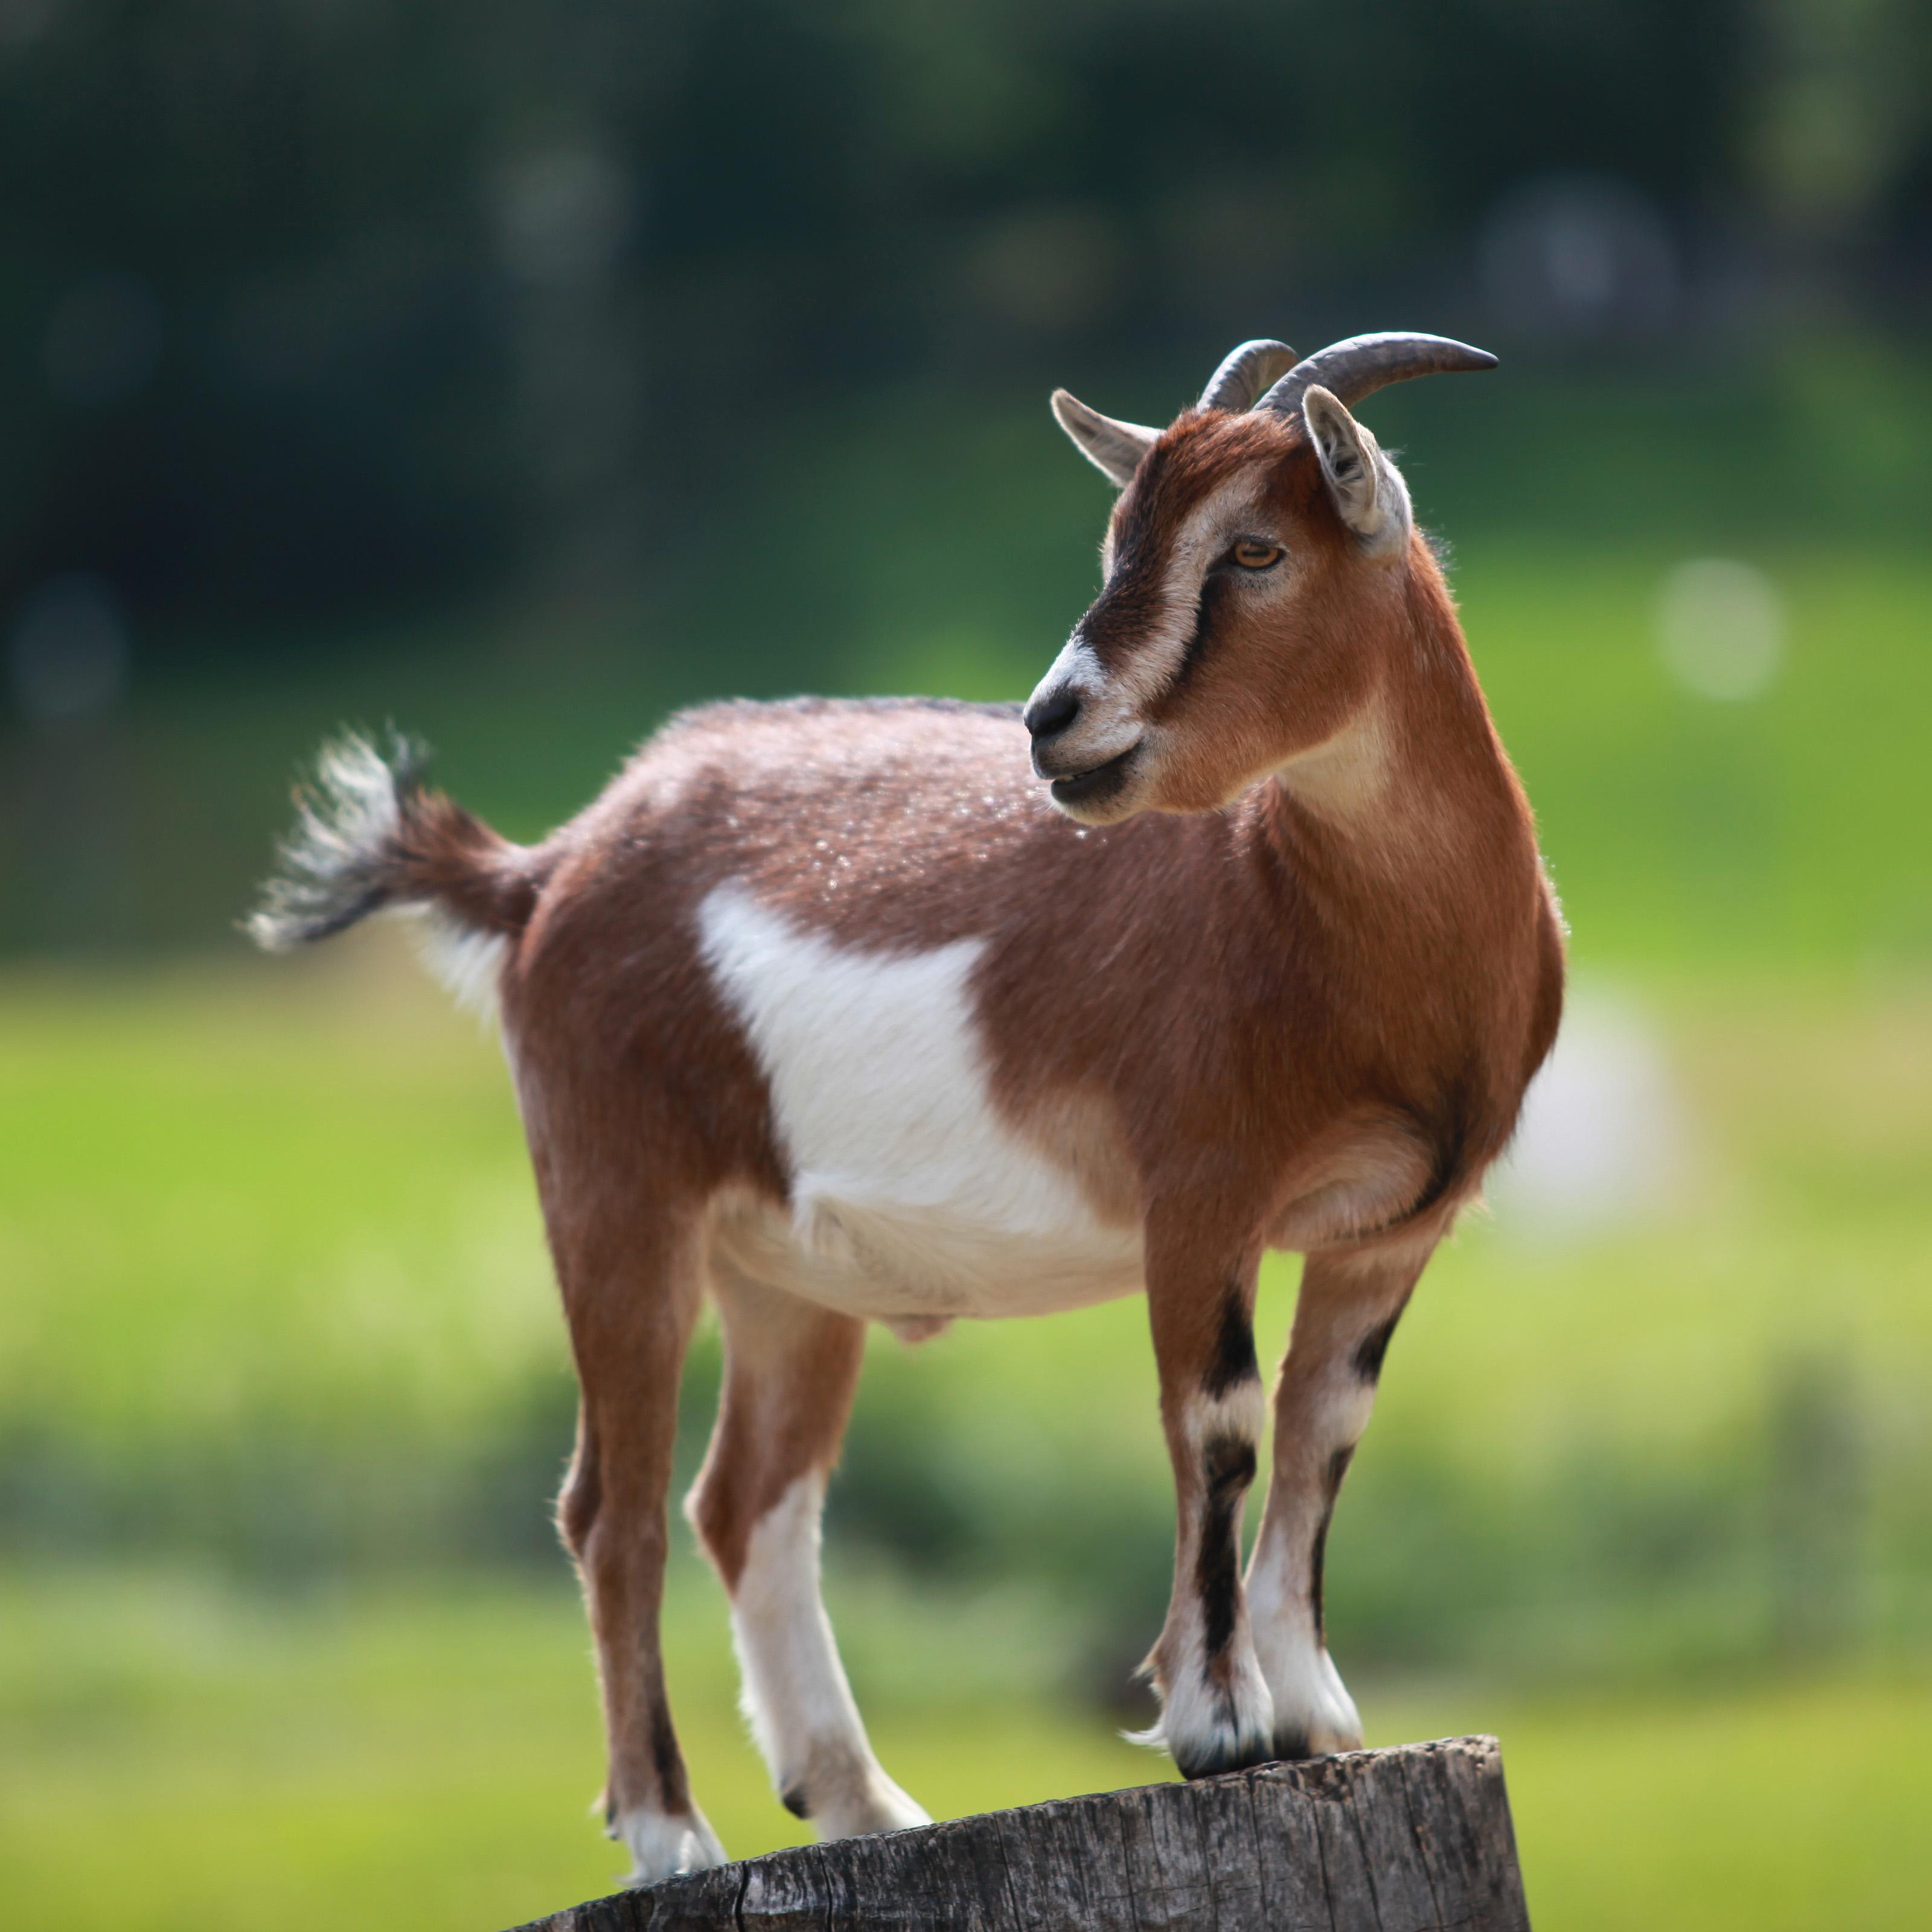 Goat w